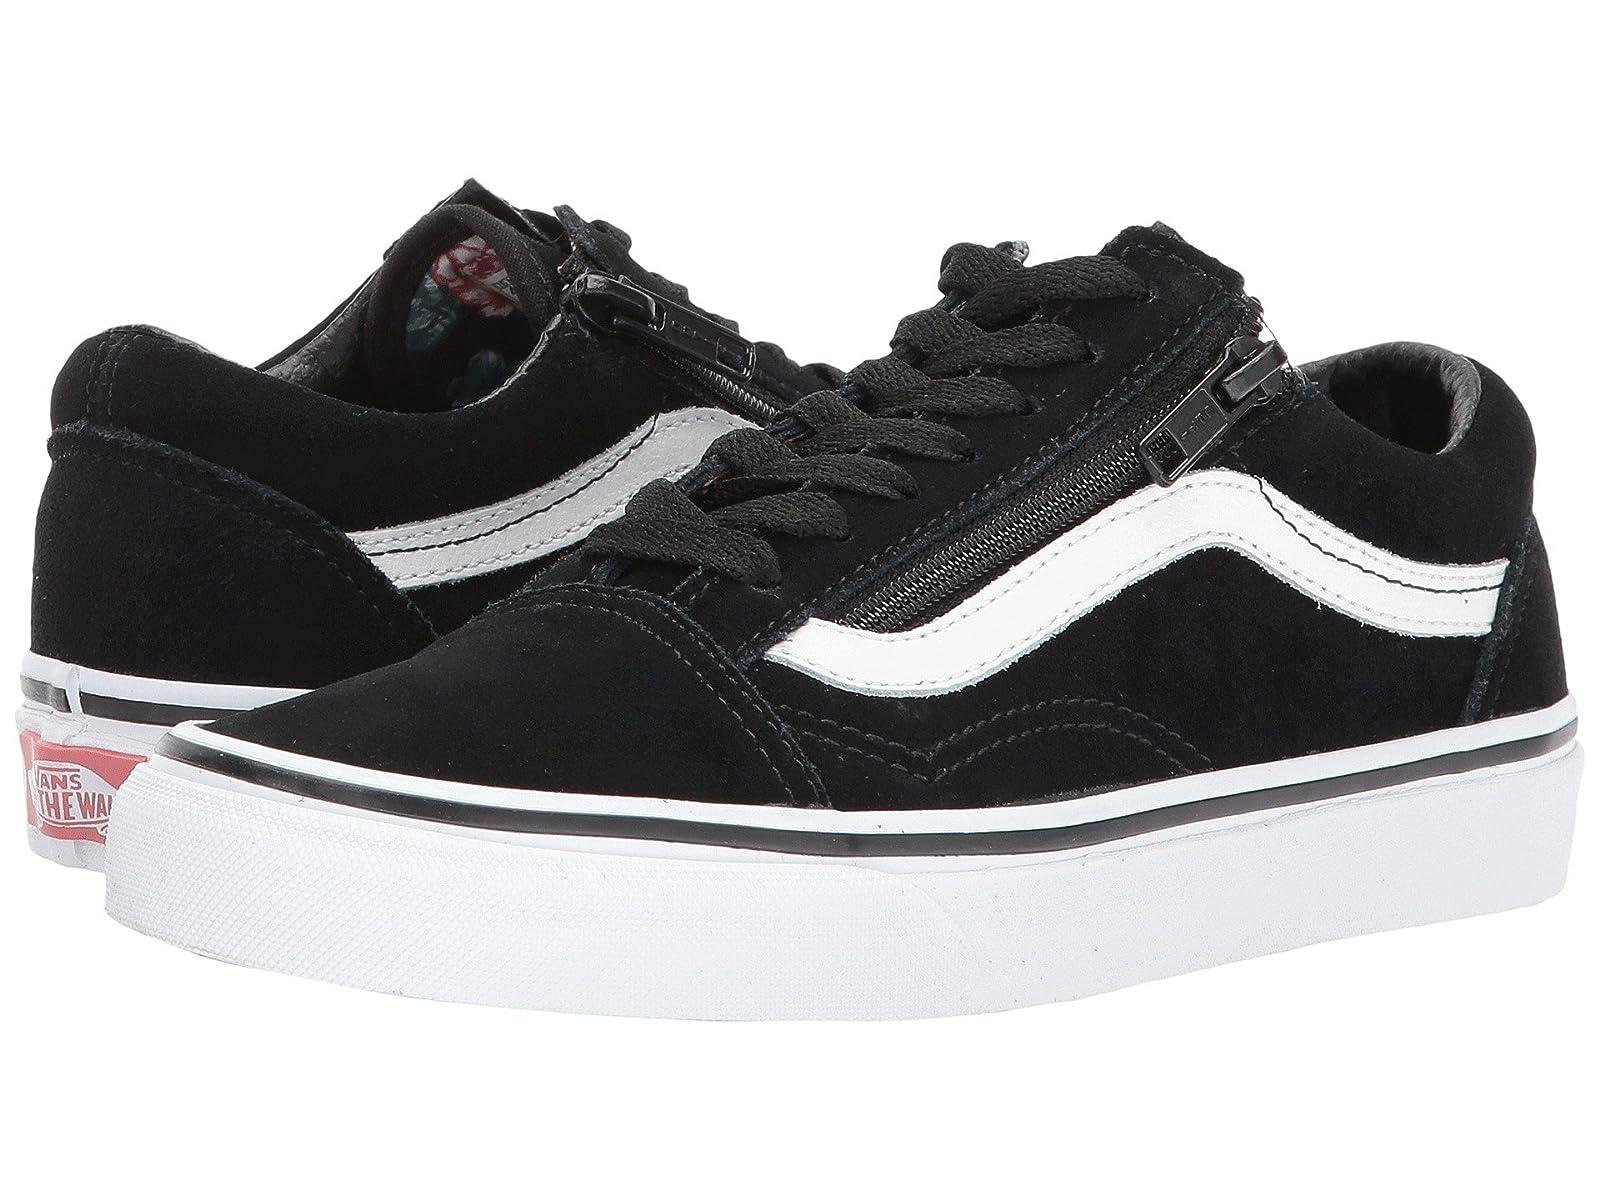 Vans Old Skool ZipAtmospheric grades have affordable shoes